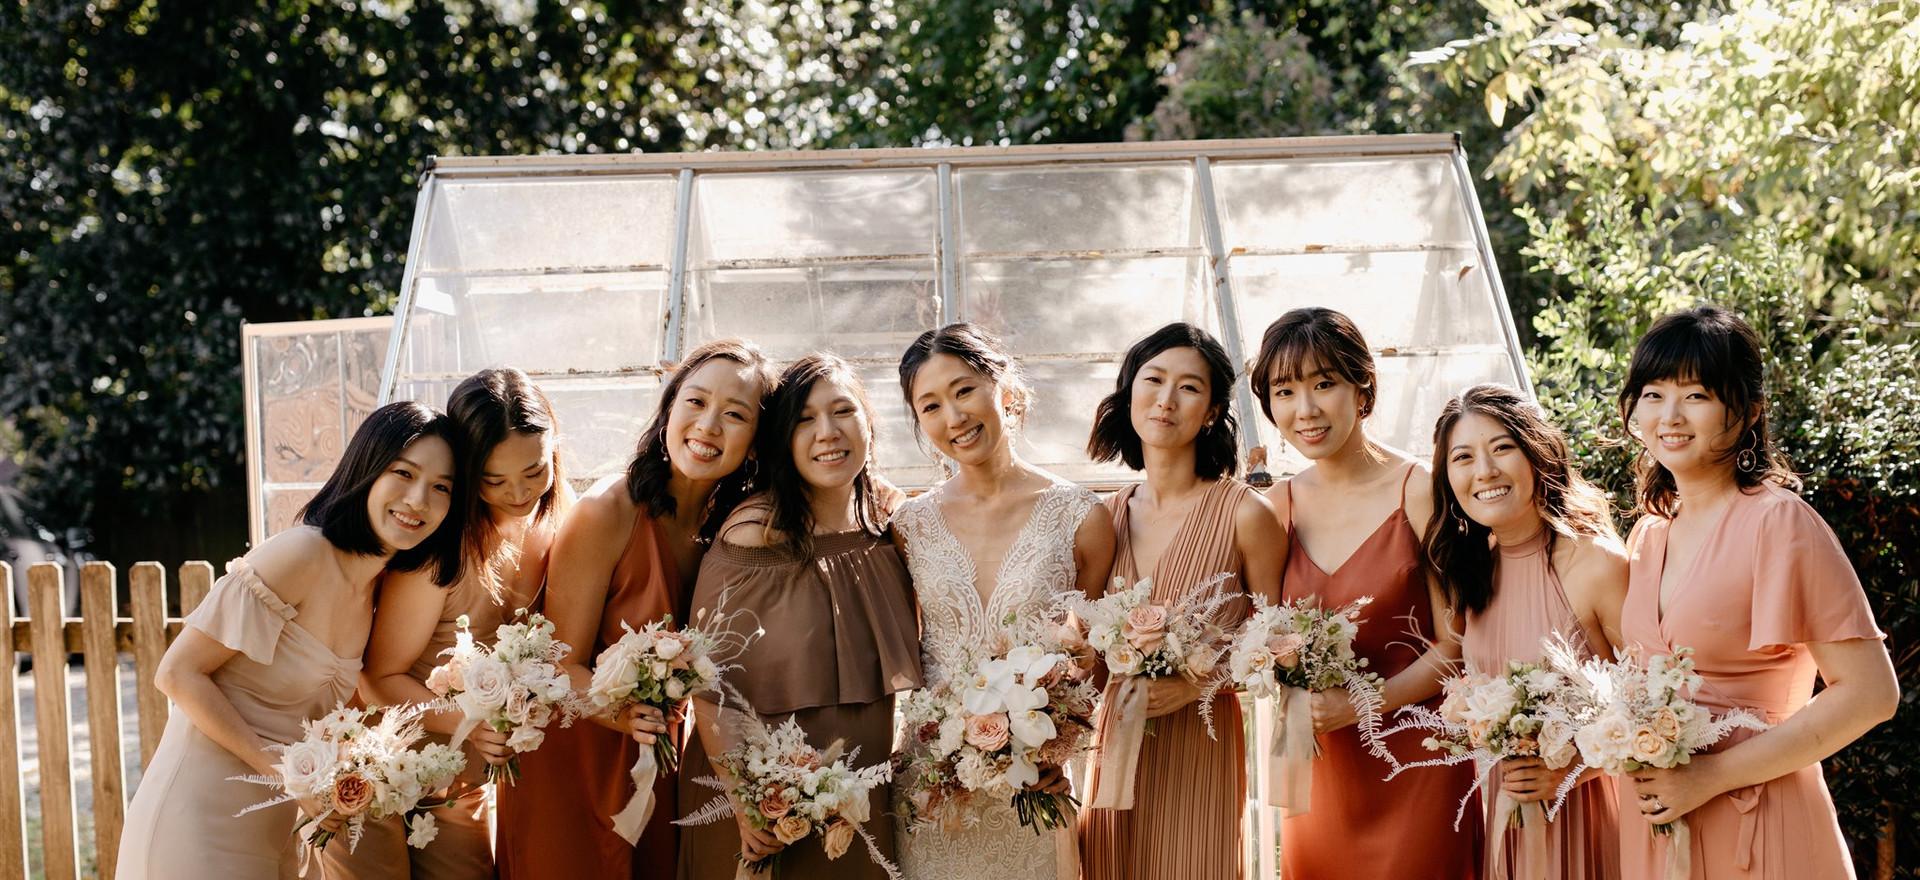 emily-allen-wedding-2032.jpg